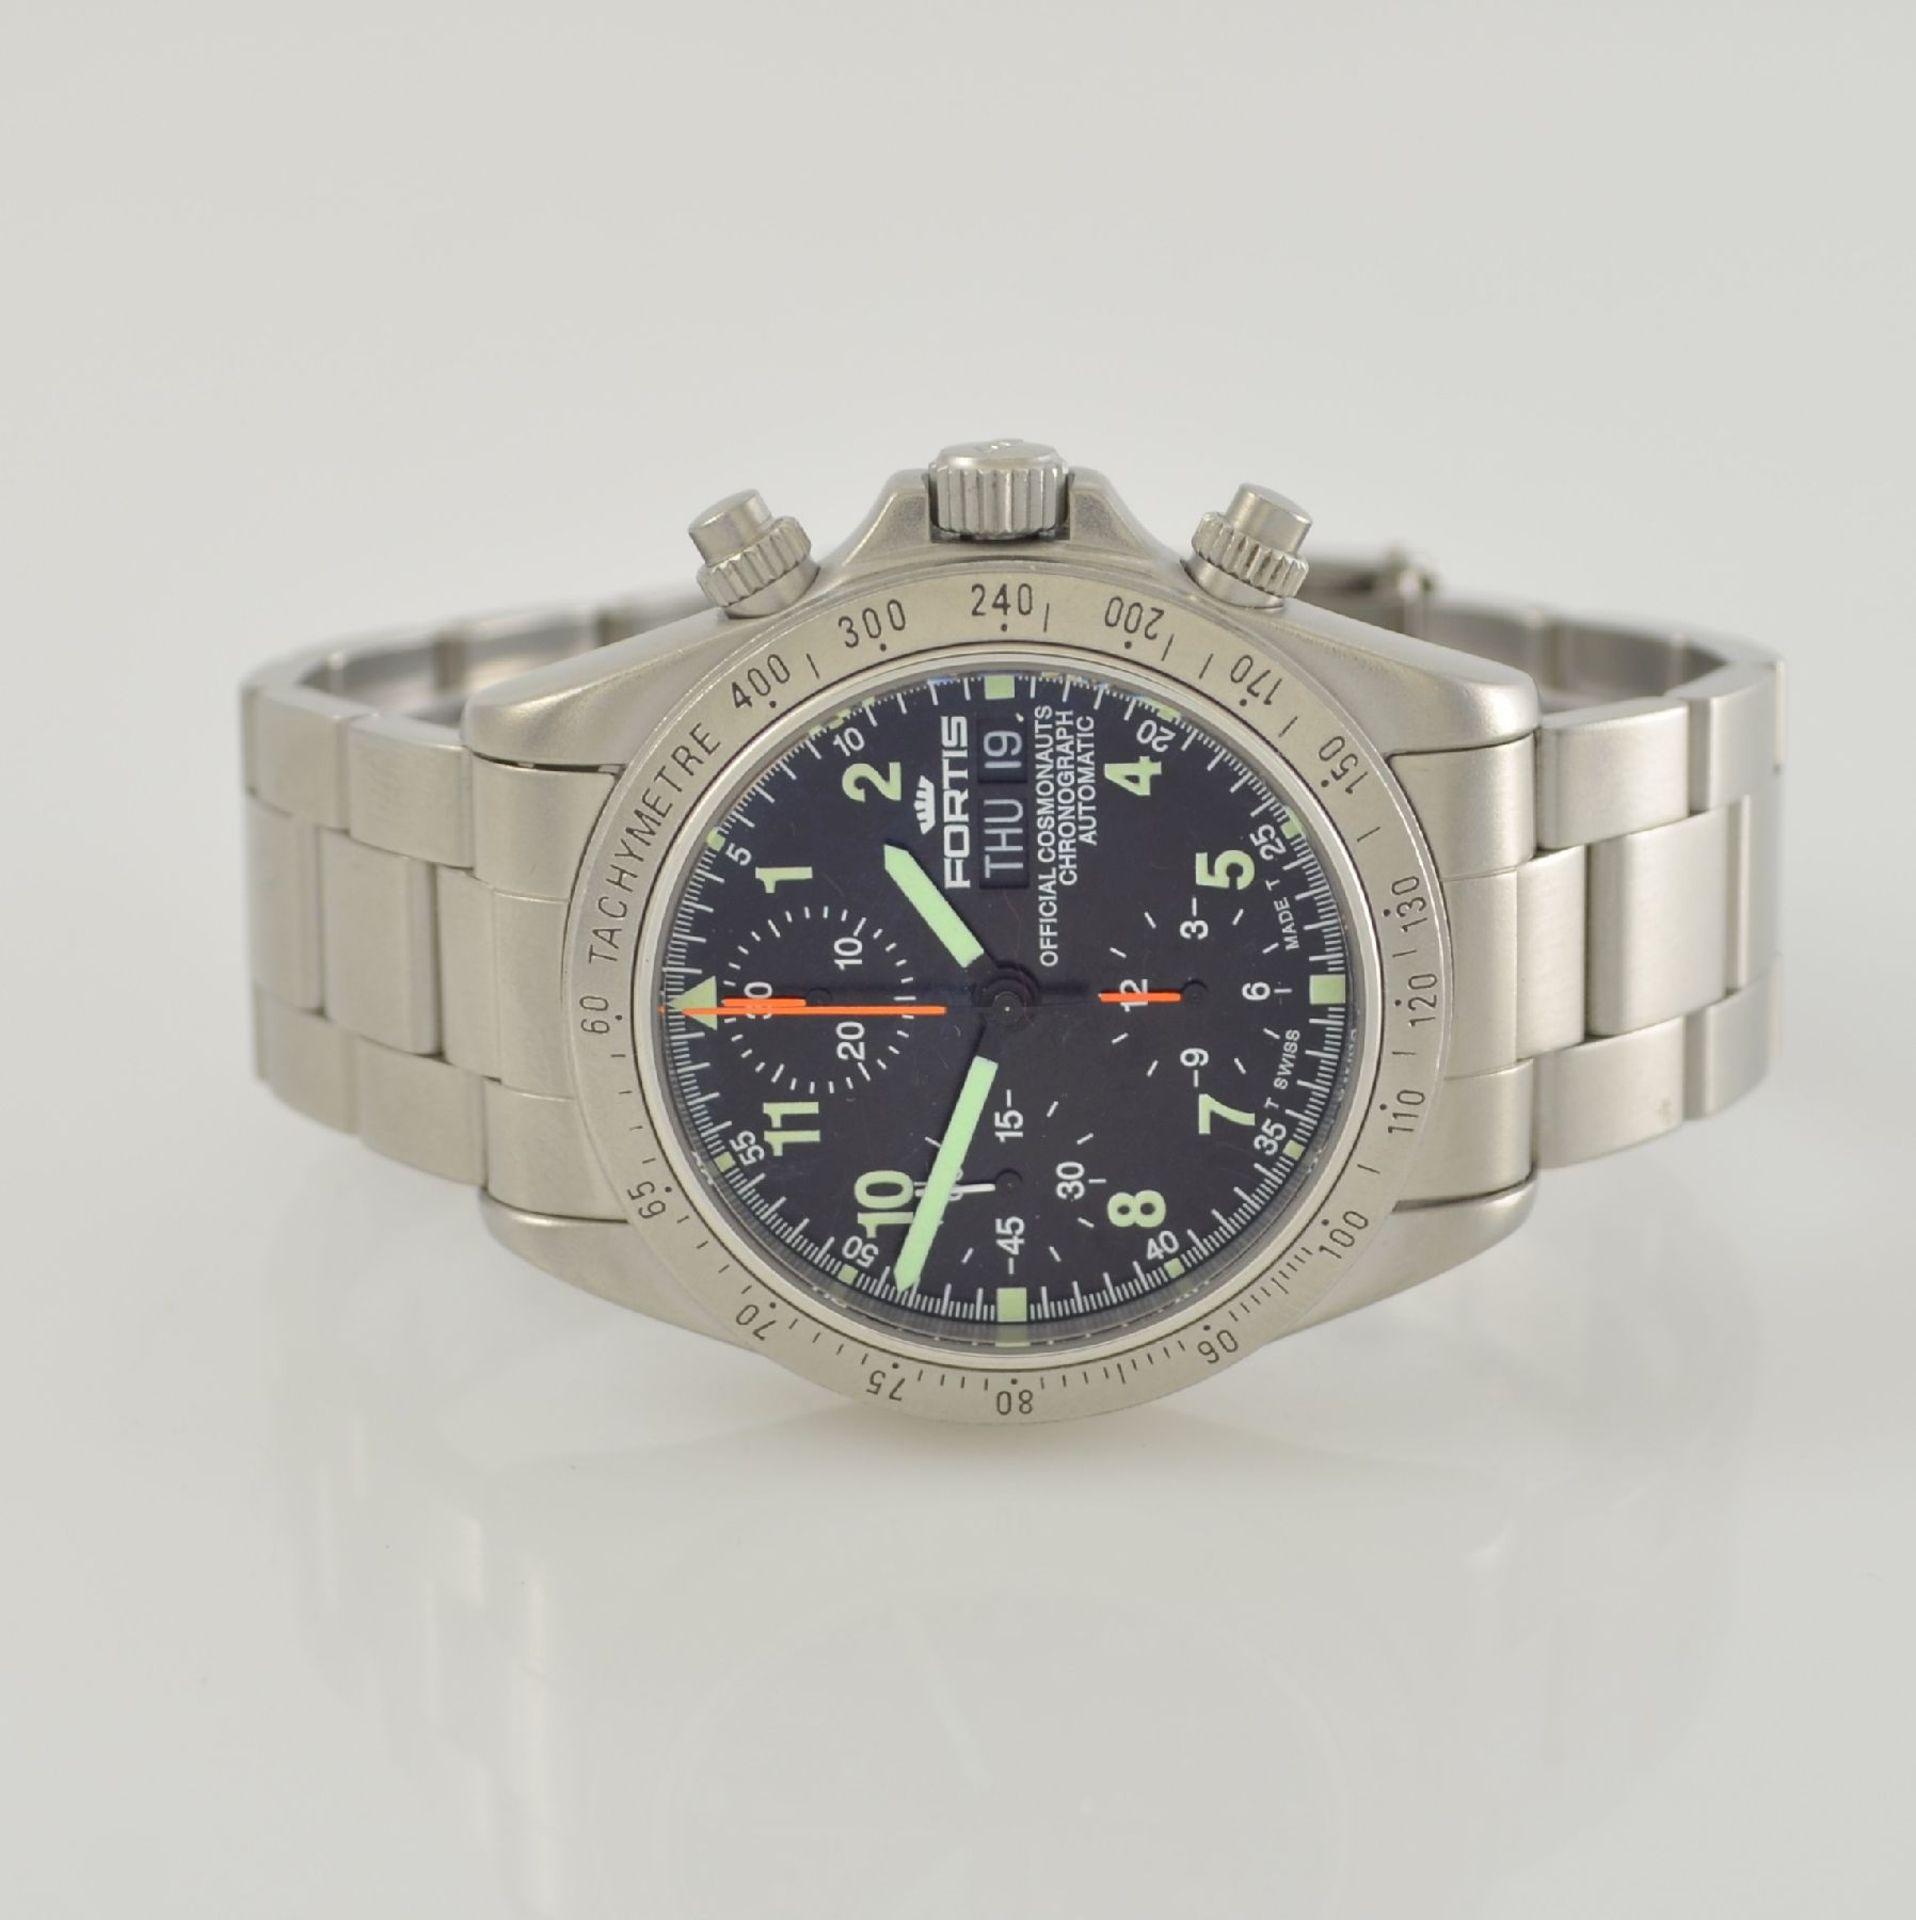 "FORTIS Herrenarmbanduhr ""Cosmonauts Chronograph"", Automatik, Schweiz um 1997, Ref. 630.22.141, matt."